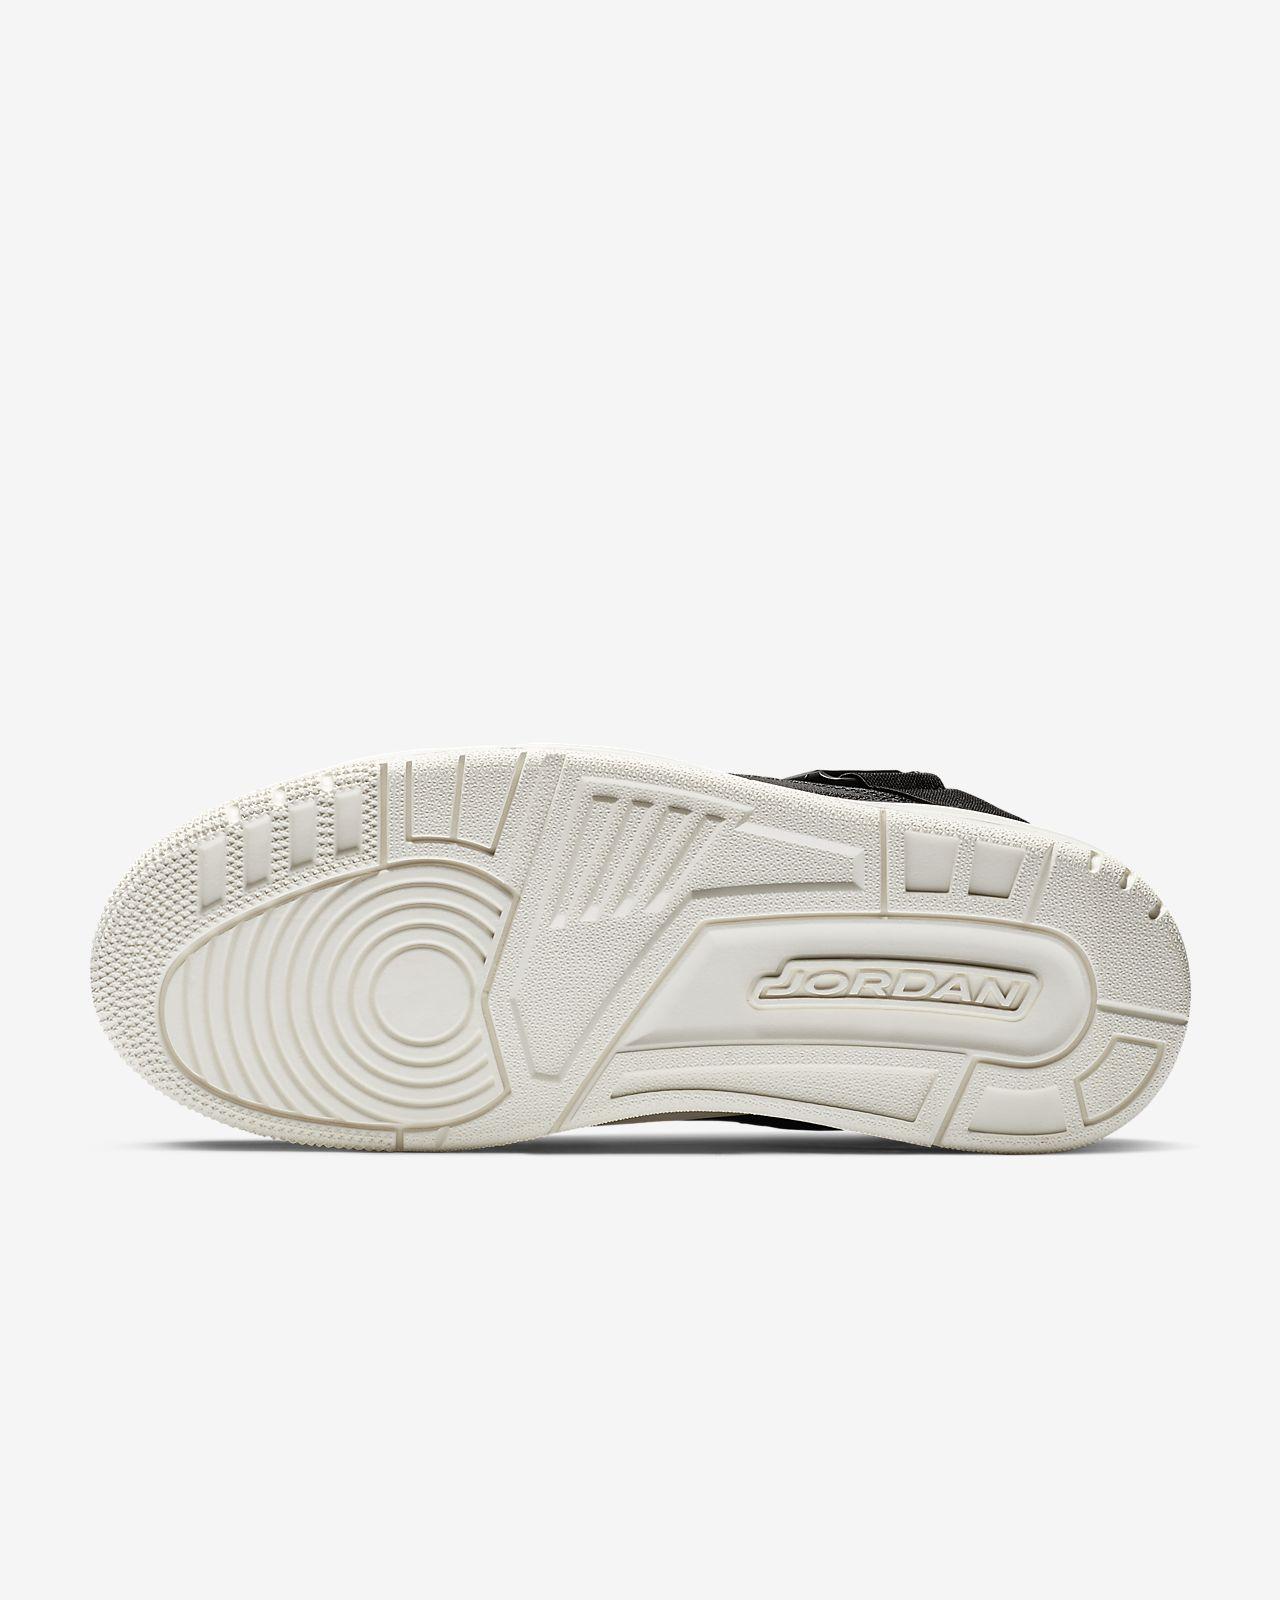 28d48791c01e Air Jordan 3 Retro Explorer XX Women s Shoe. Nike.com